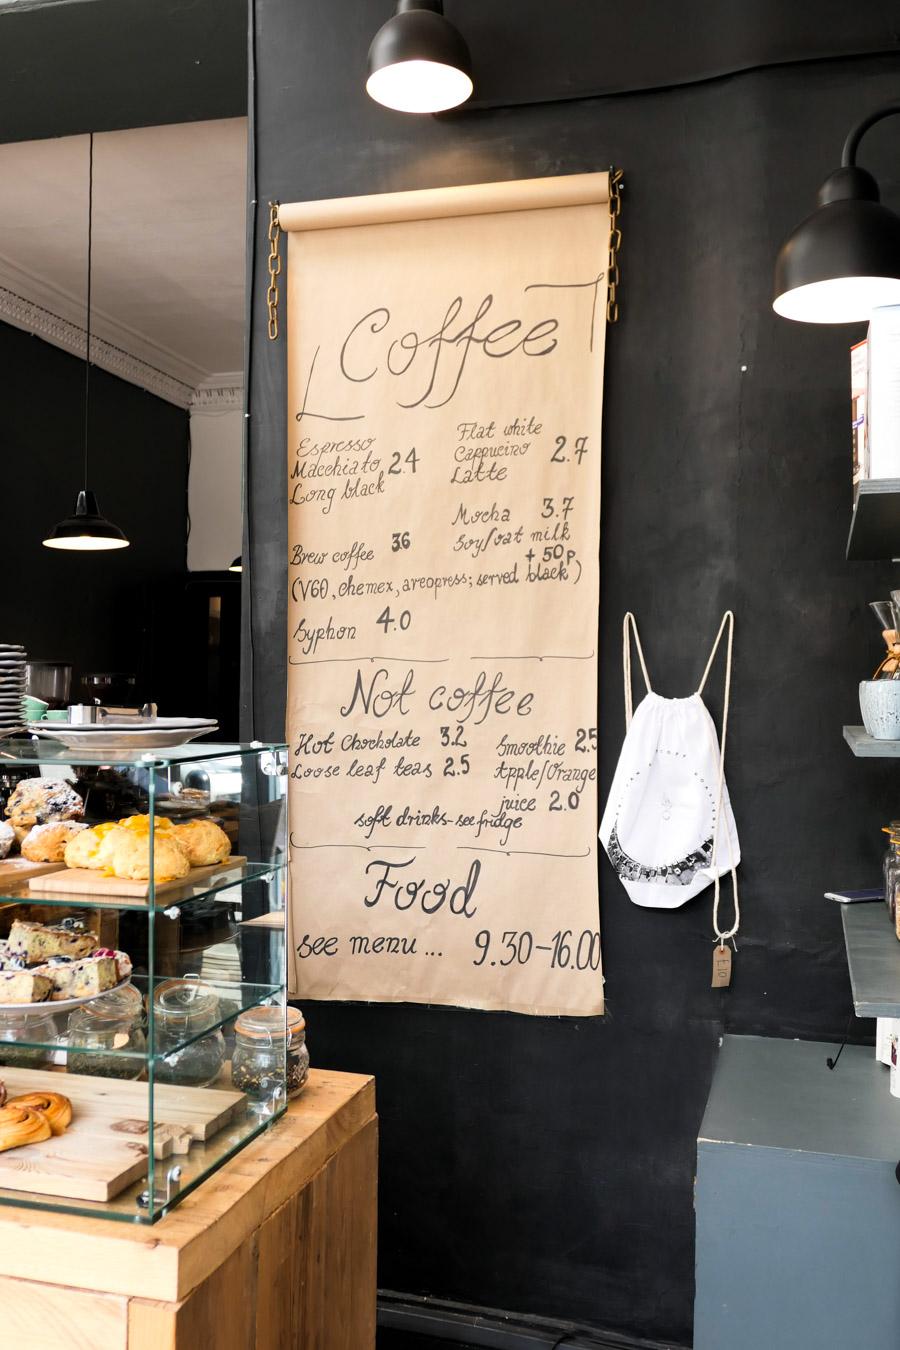 Best Stockbridge Edinburgh Restaurants Travel Guide - Artisan Coffee Roasters